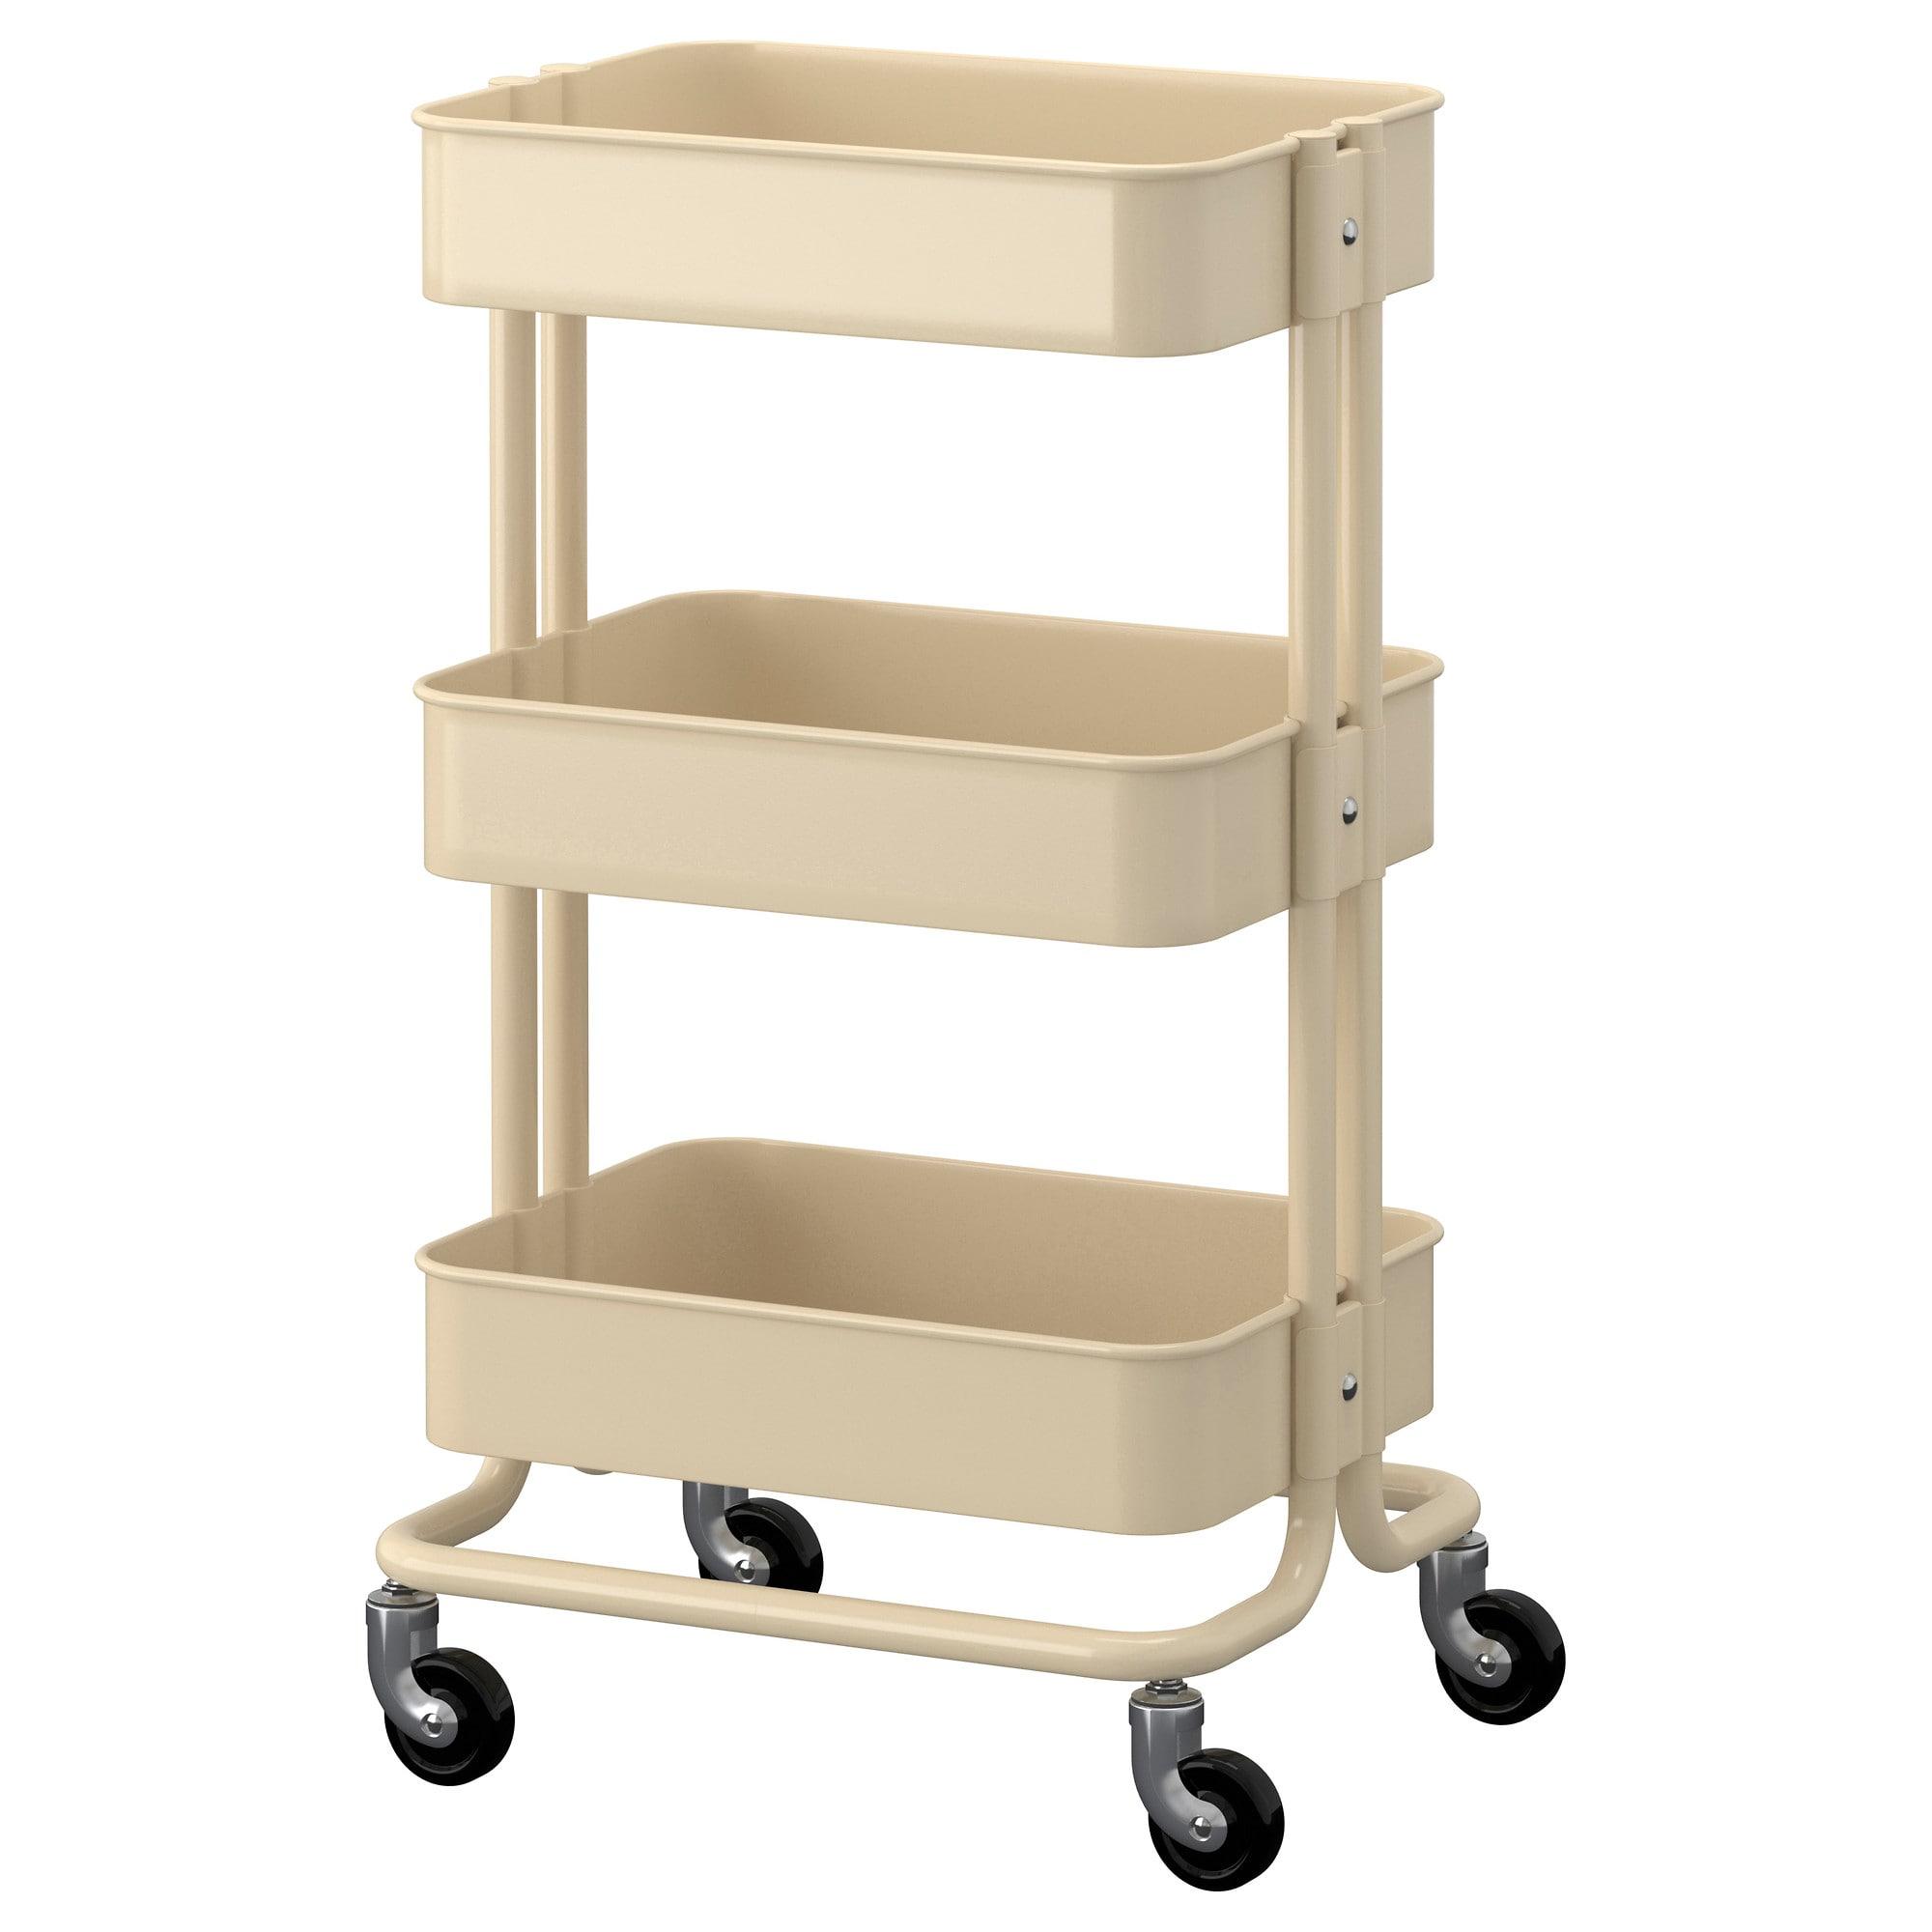 RÅskog Utility Cart Ikea For Nursing Side Table Or Next To Changing